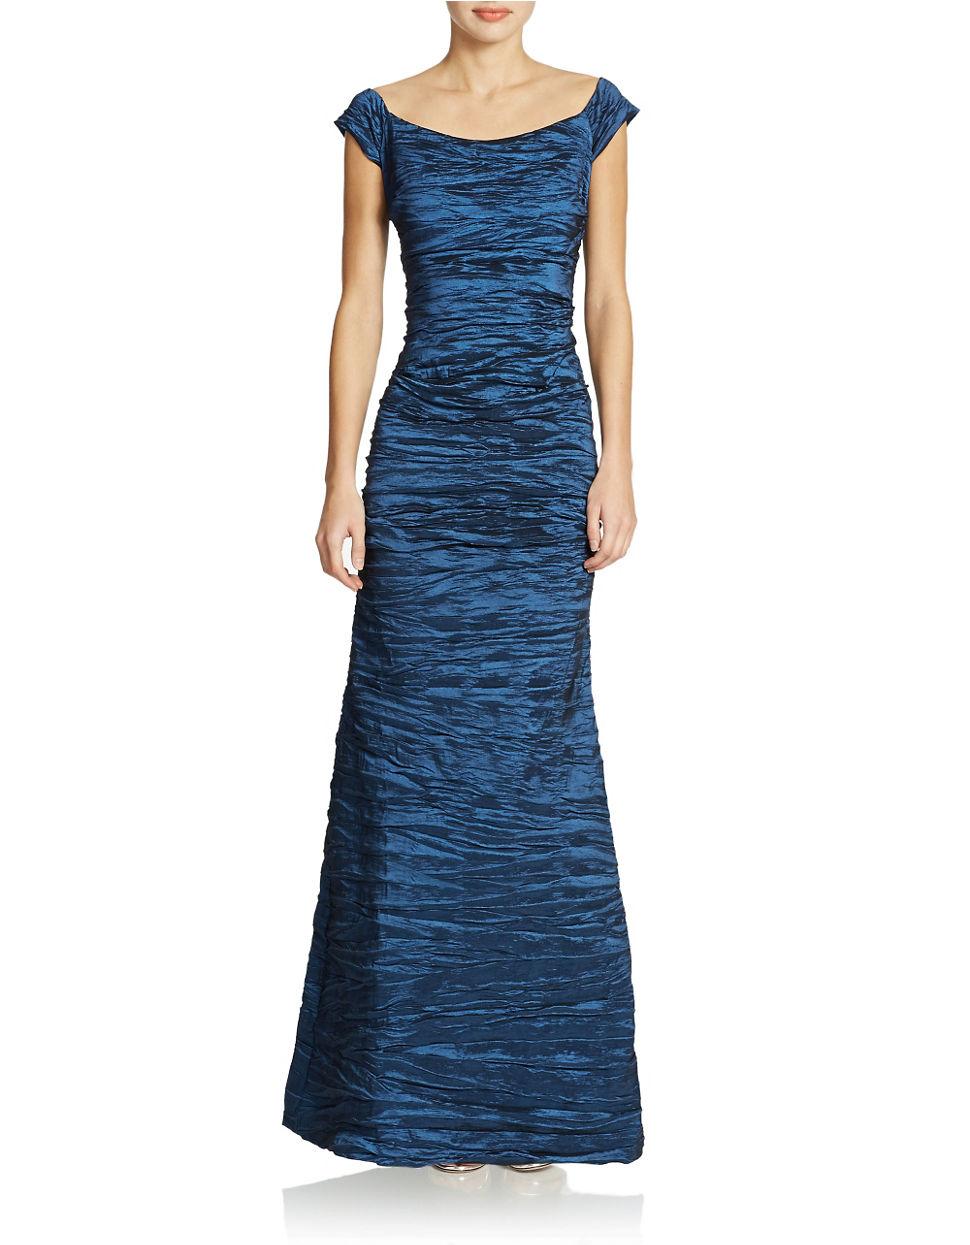 85e0a4dc53b Lyst - Alex Evenings Long Off The Shoulder Stretch Taffeta Dress in Blue